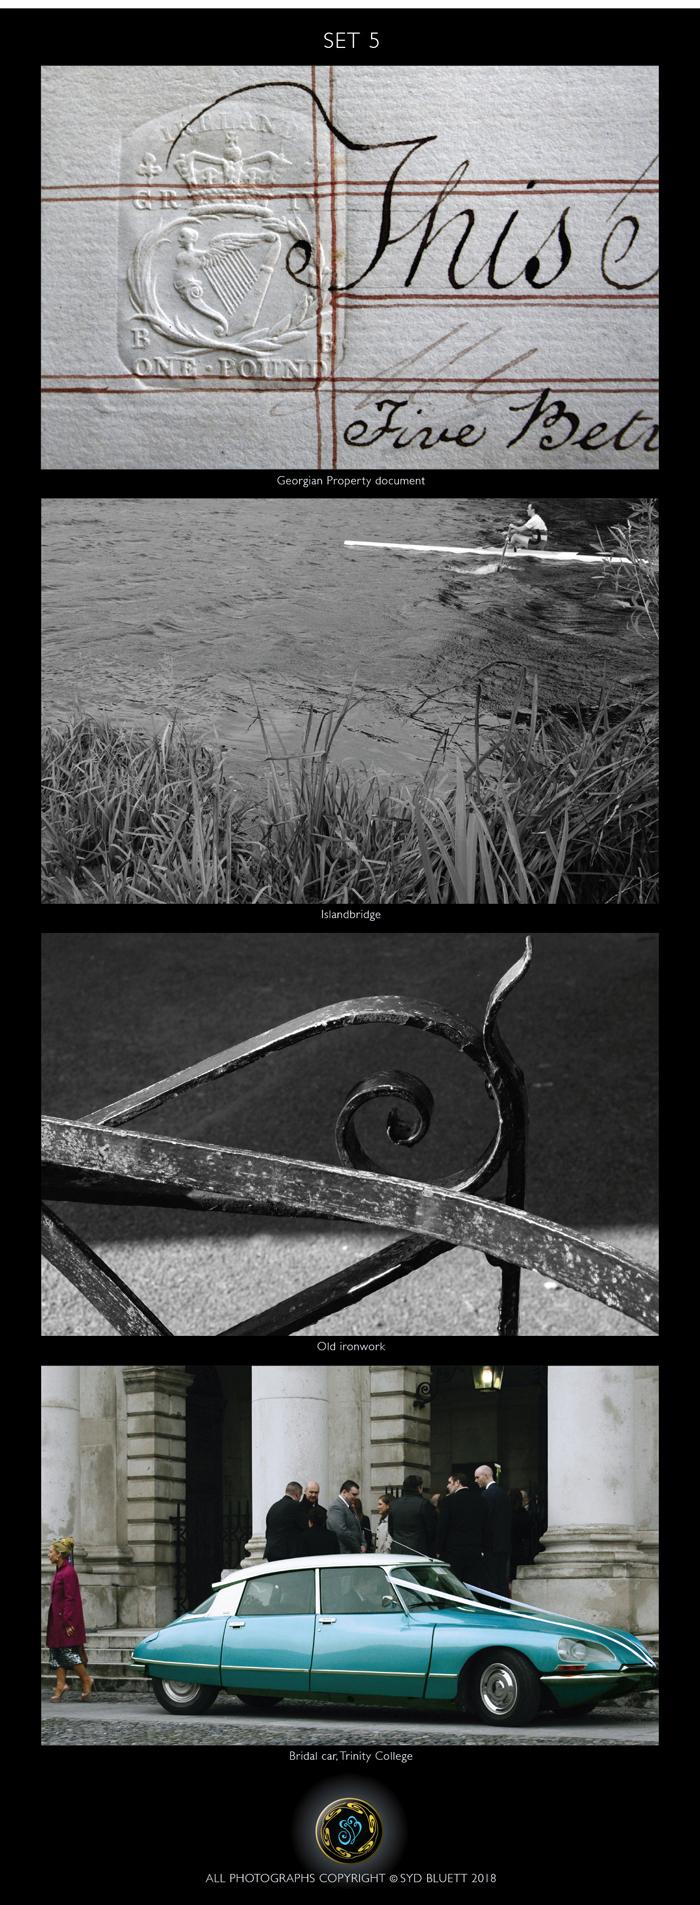 Photographs by Syd Bluett